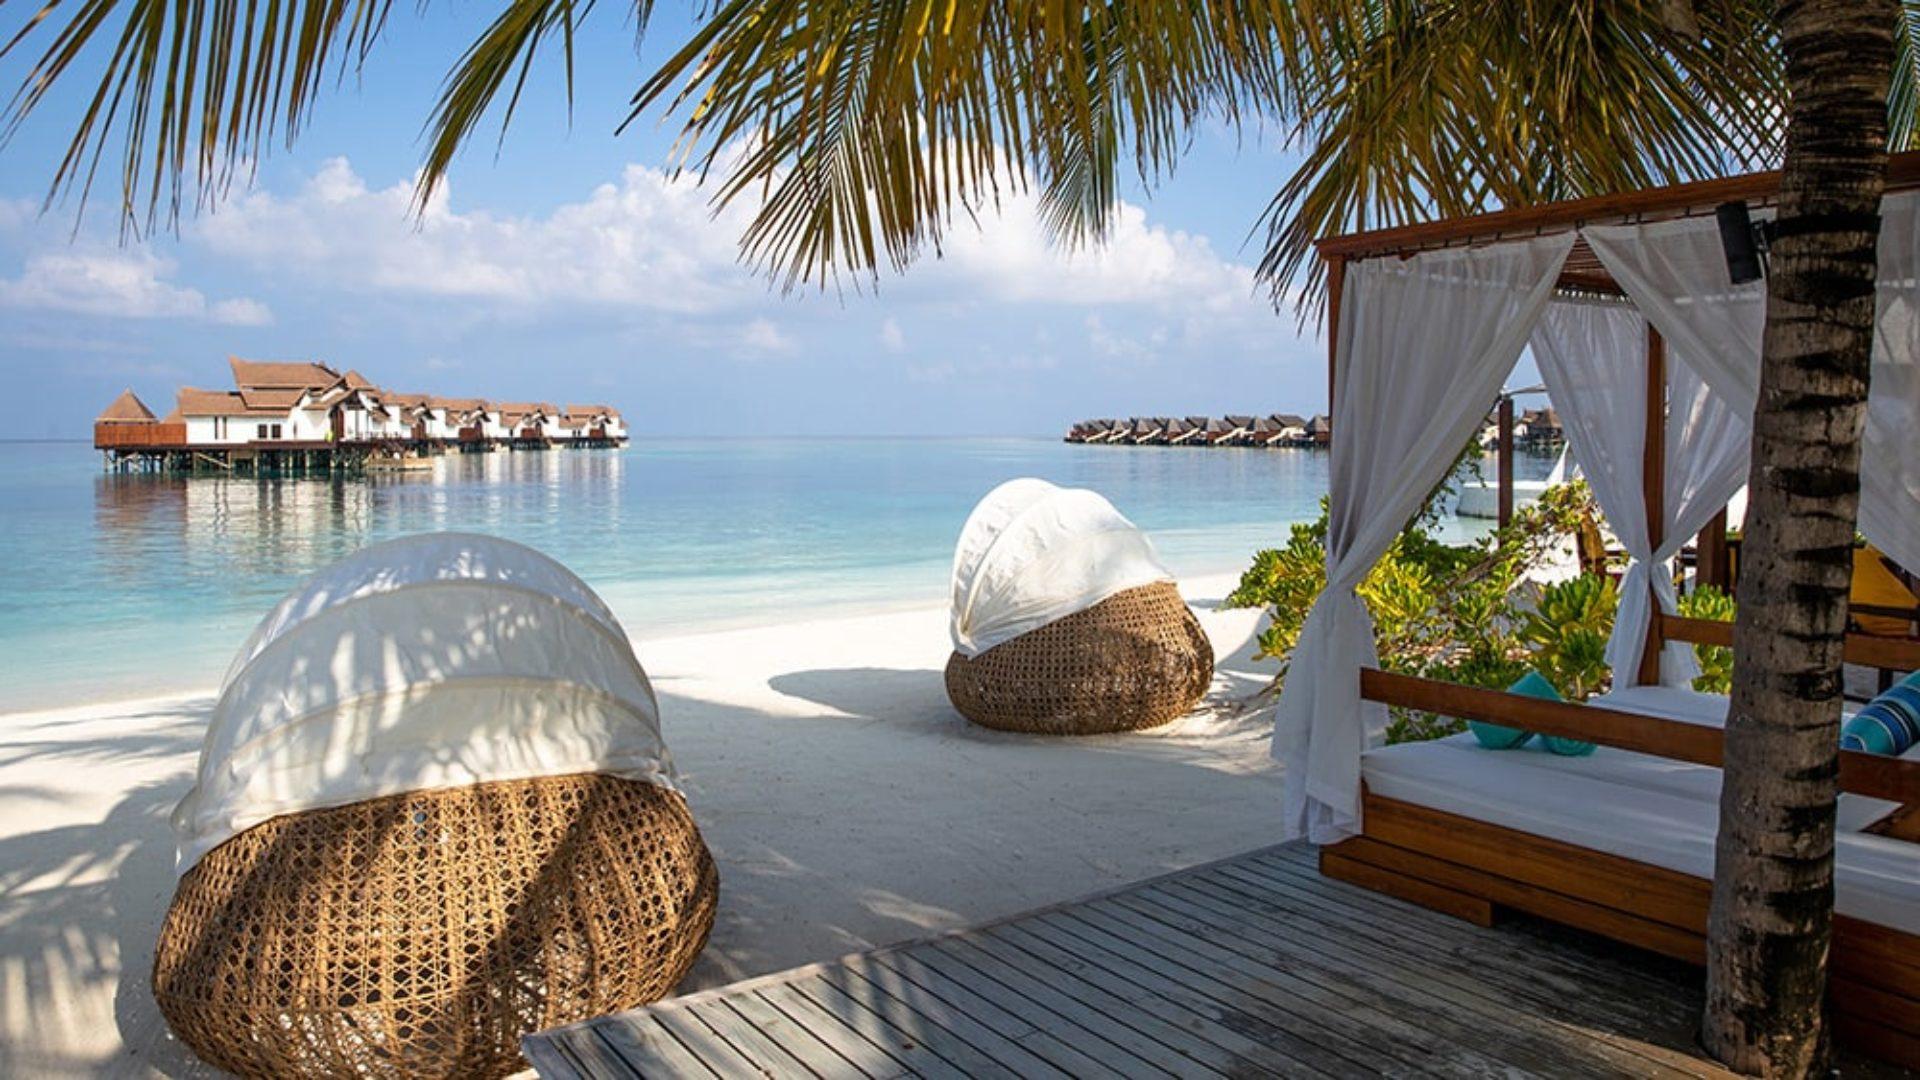 Beach loungers and a cabana under palms at Jumeirah Vittaveli